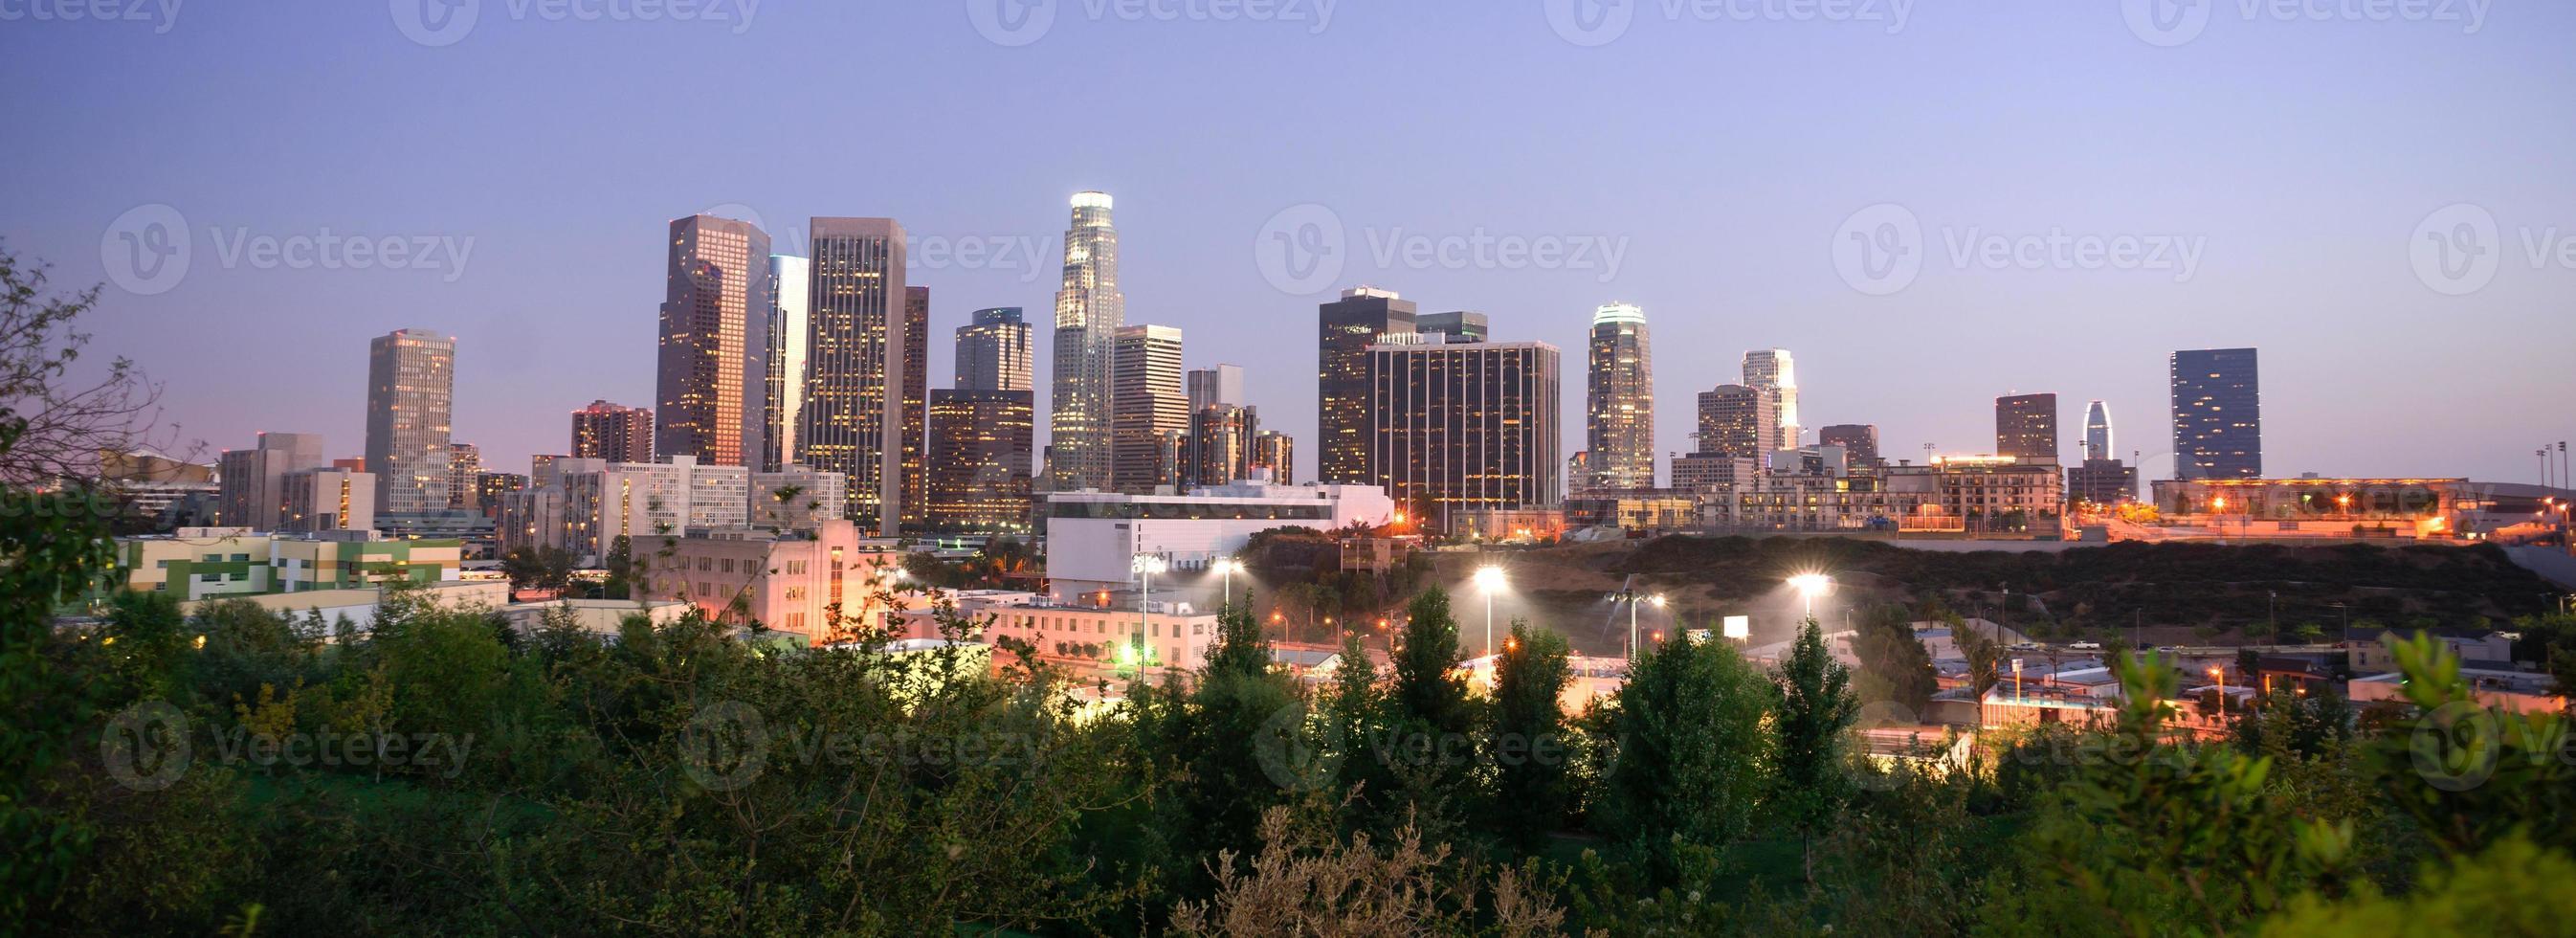 solnedgång los angeles california centrum horisont foto